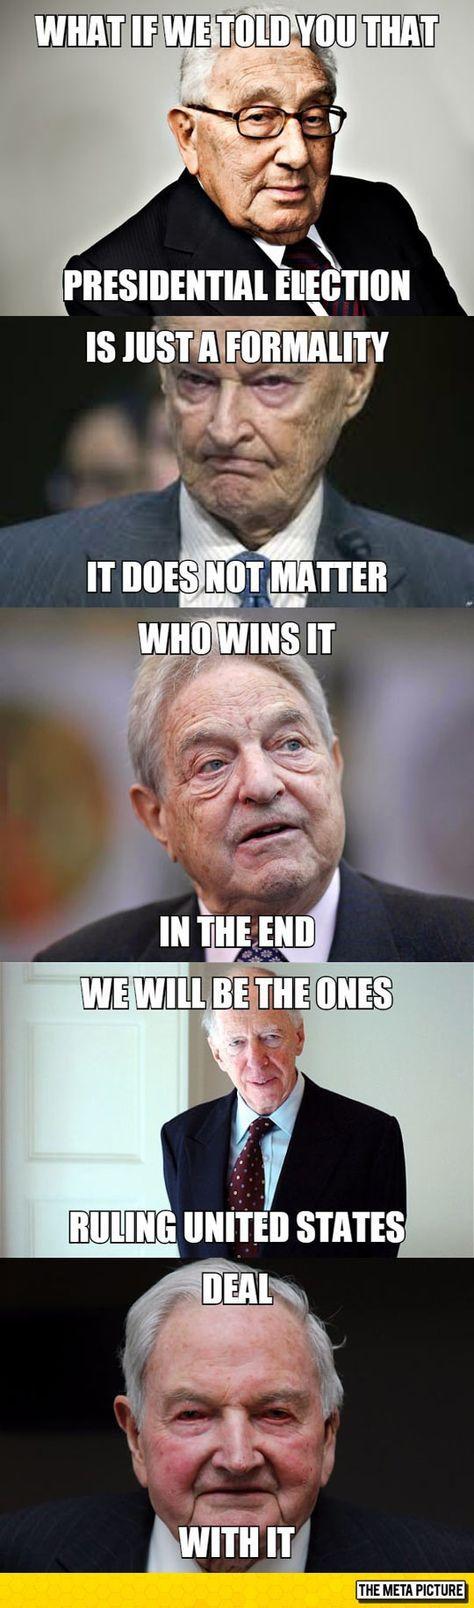 1st Henry Kissinger 2nd Zbigniew Brzezinski 3rd George Soros 4th Jacob Rothschild 5th David Rockefeller